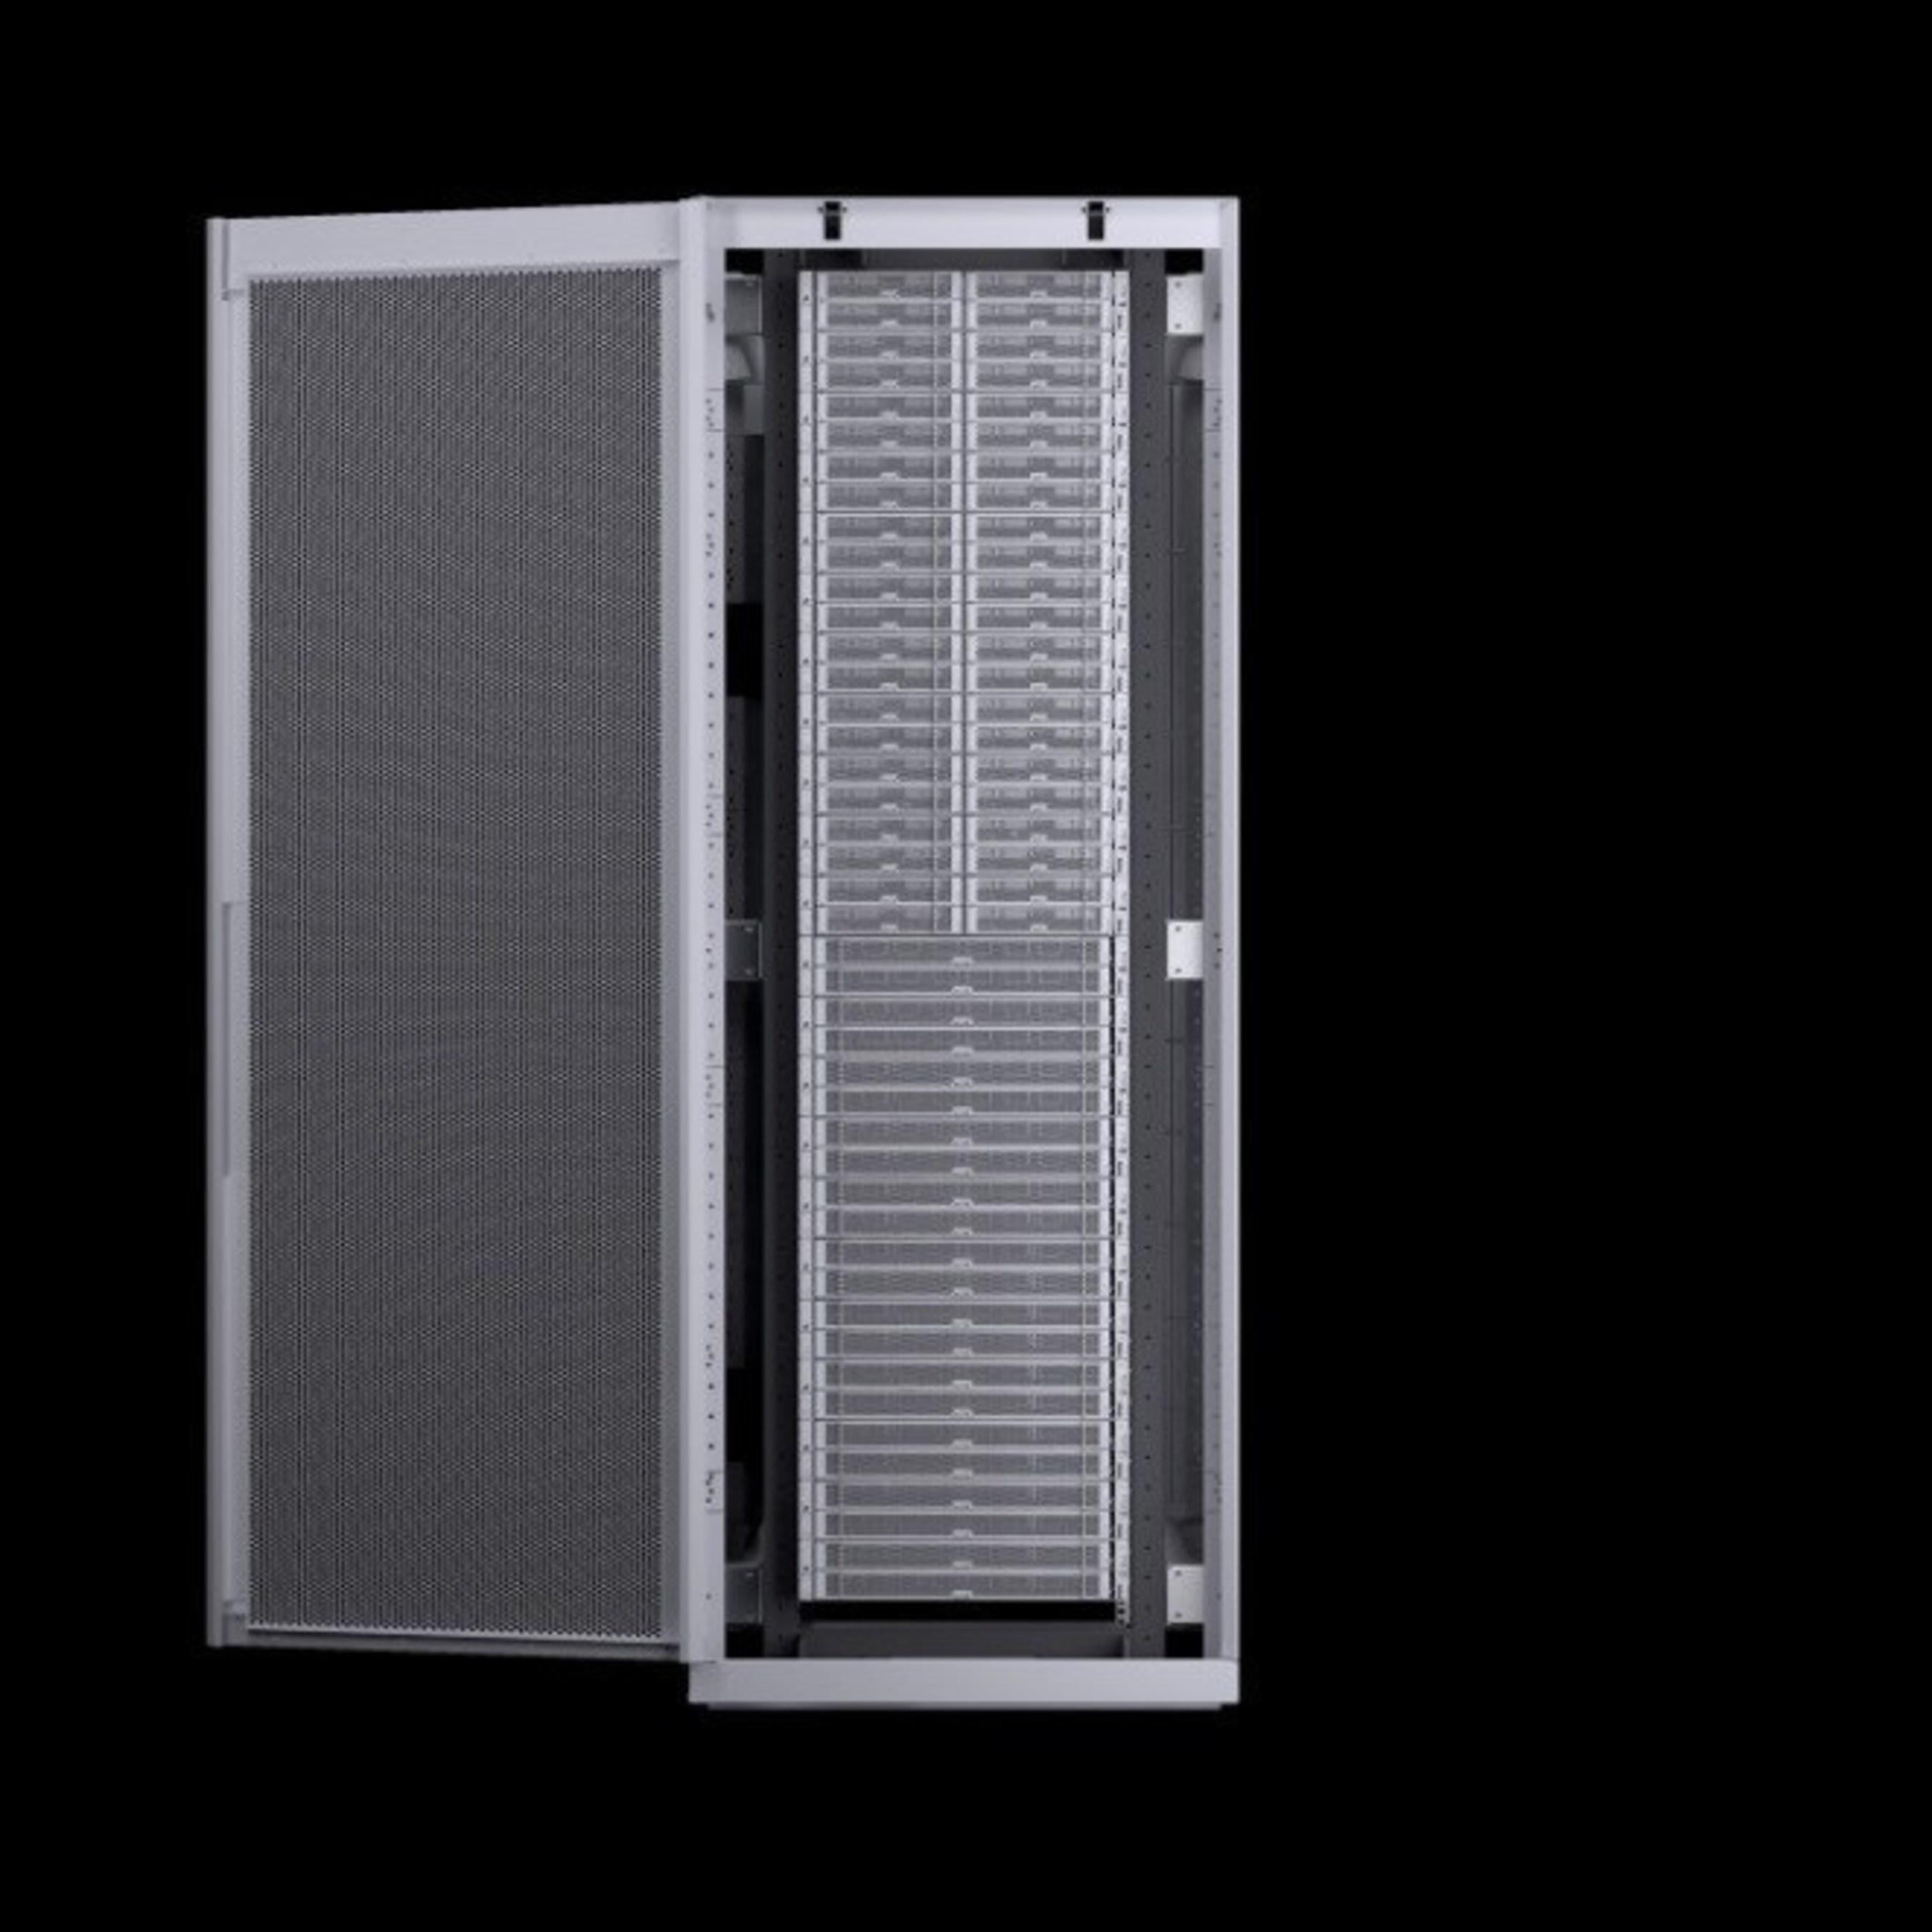 Ericsson Hyperscale Datacenter System 8000